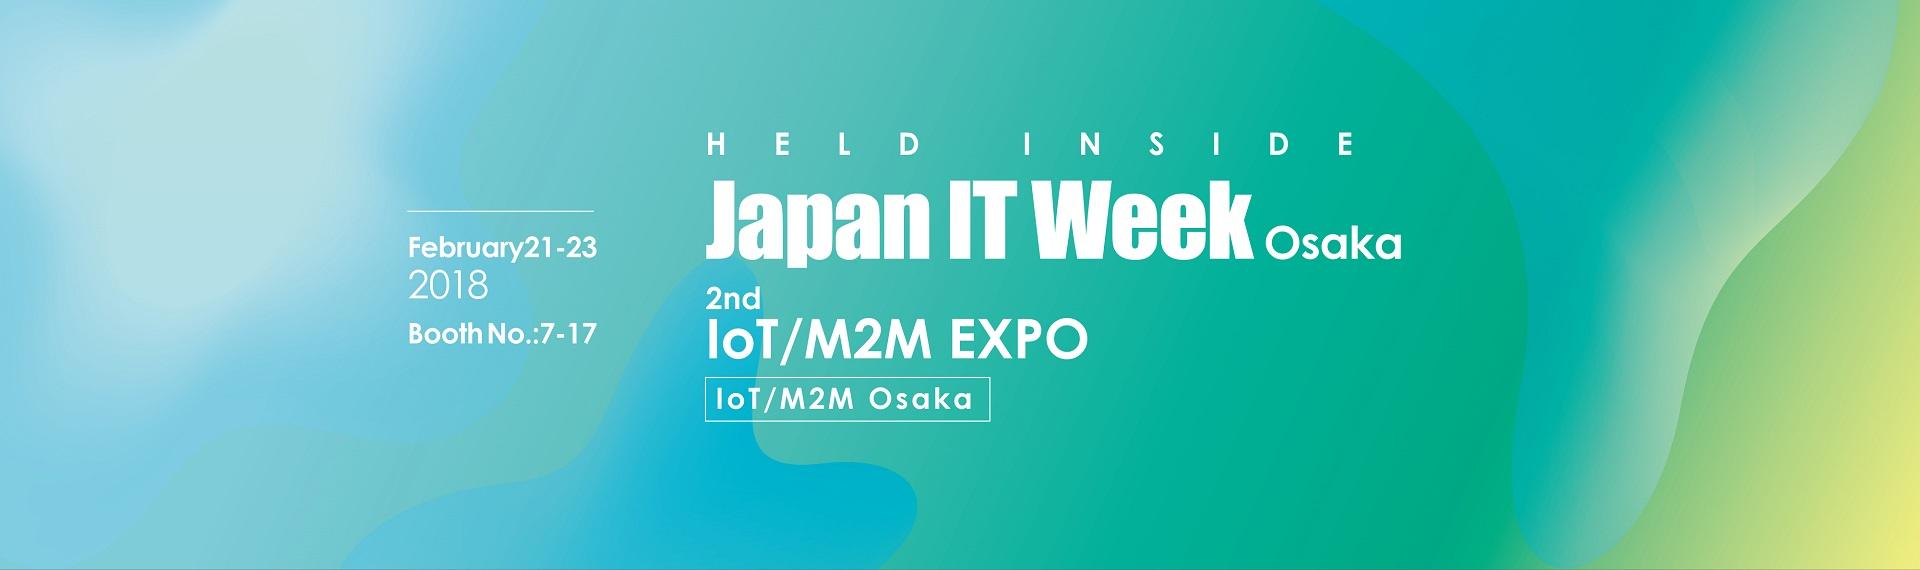 japan-it-week